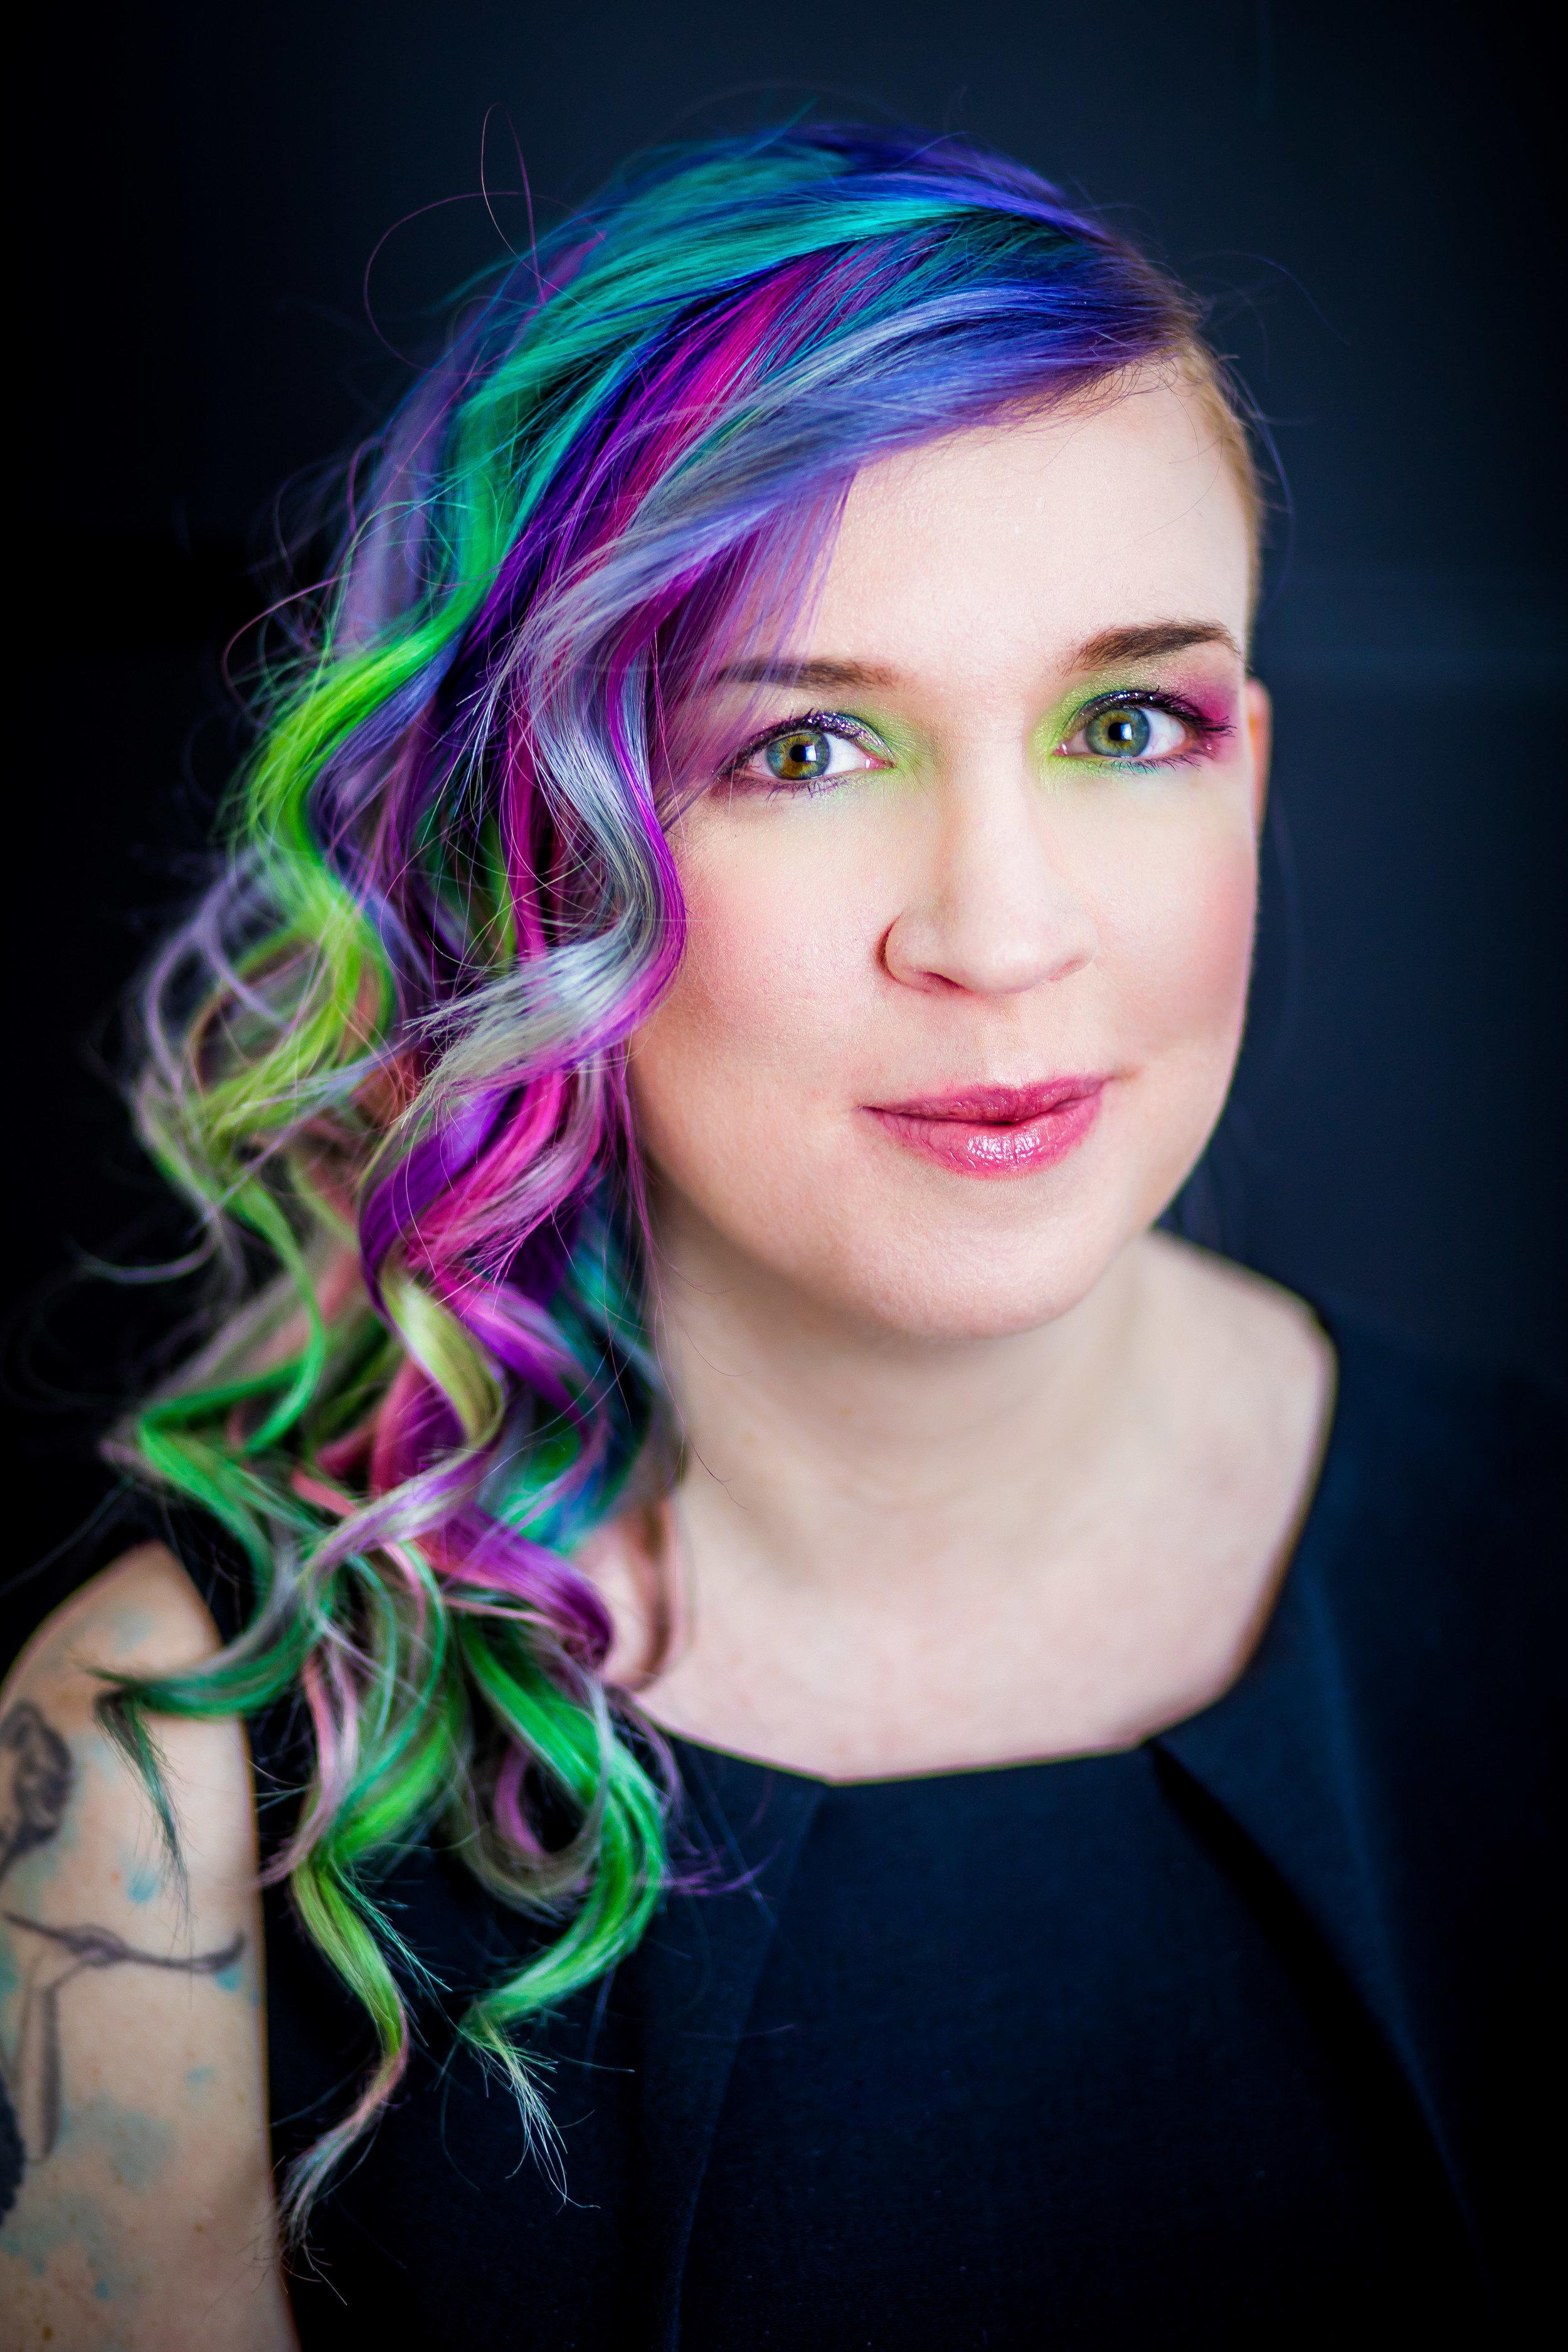 hair.color.art 2018-8048.jpg